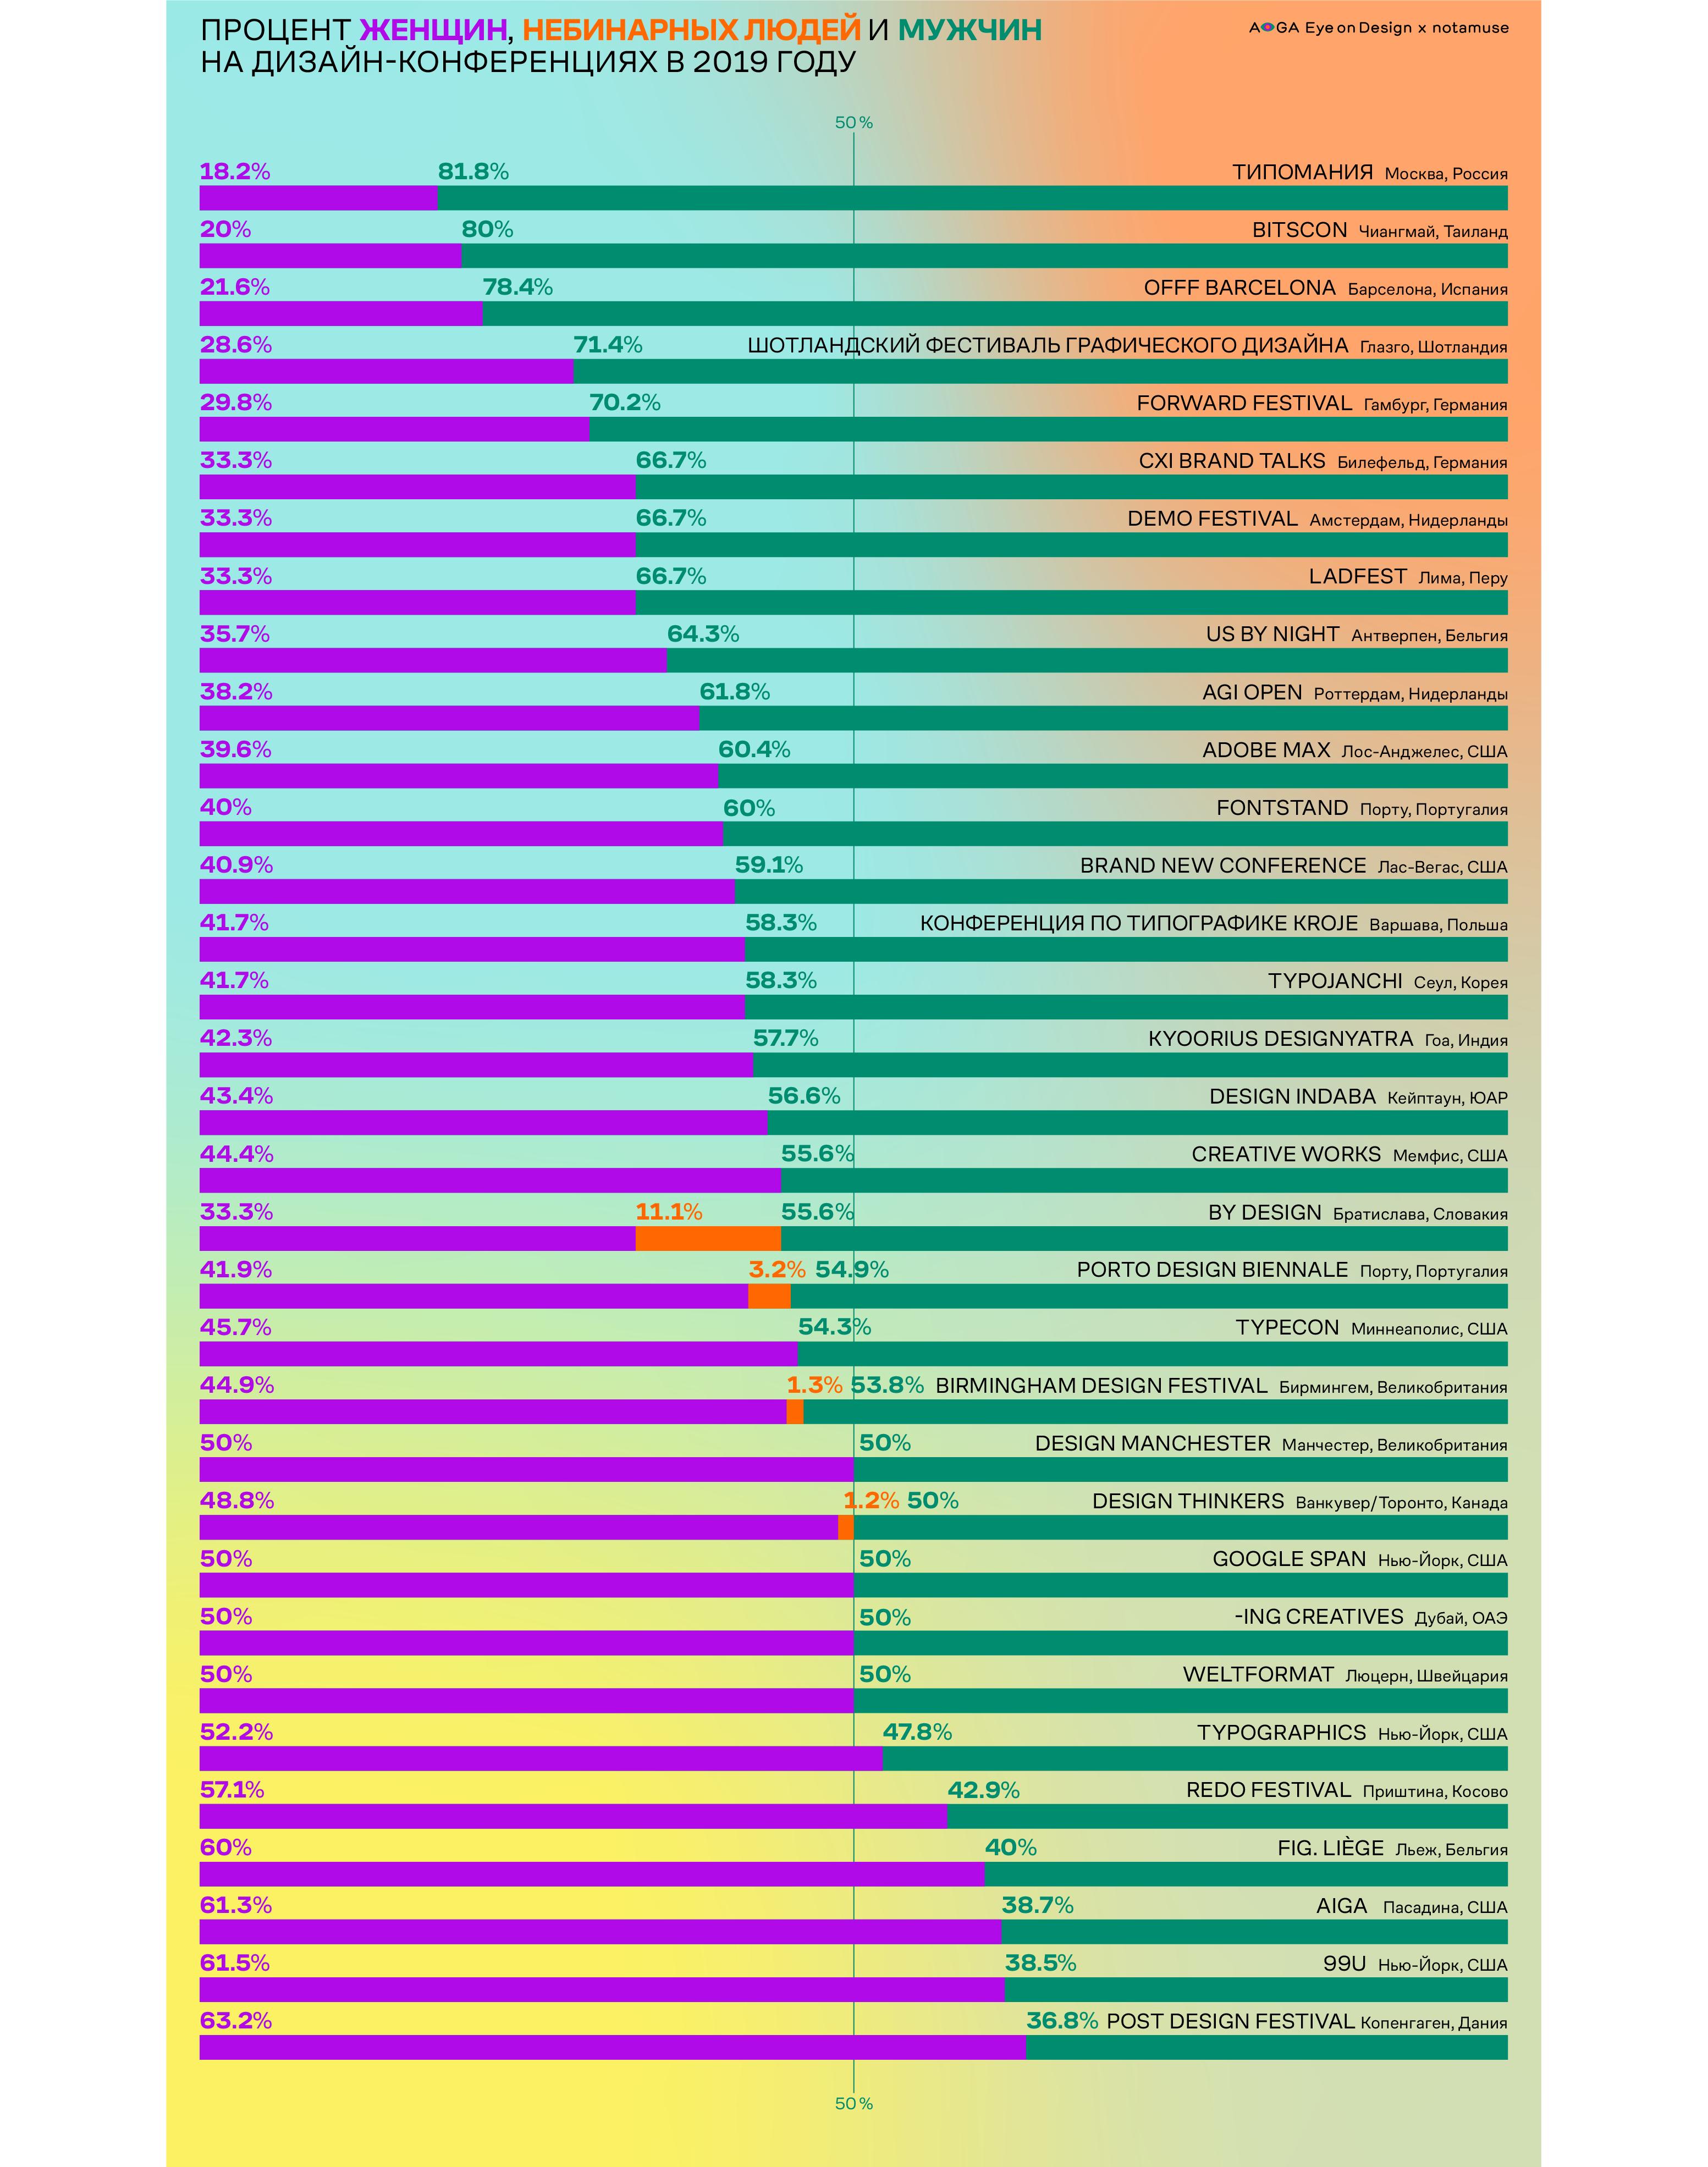 eod_study2019_infograficsarticle_rus2_bar-chart-numbers-4e42352b23dc402faf8483410d718f33.png